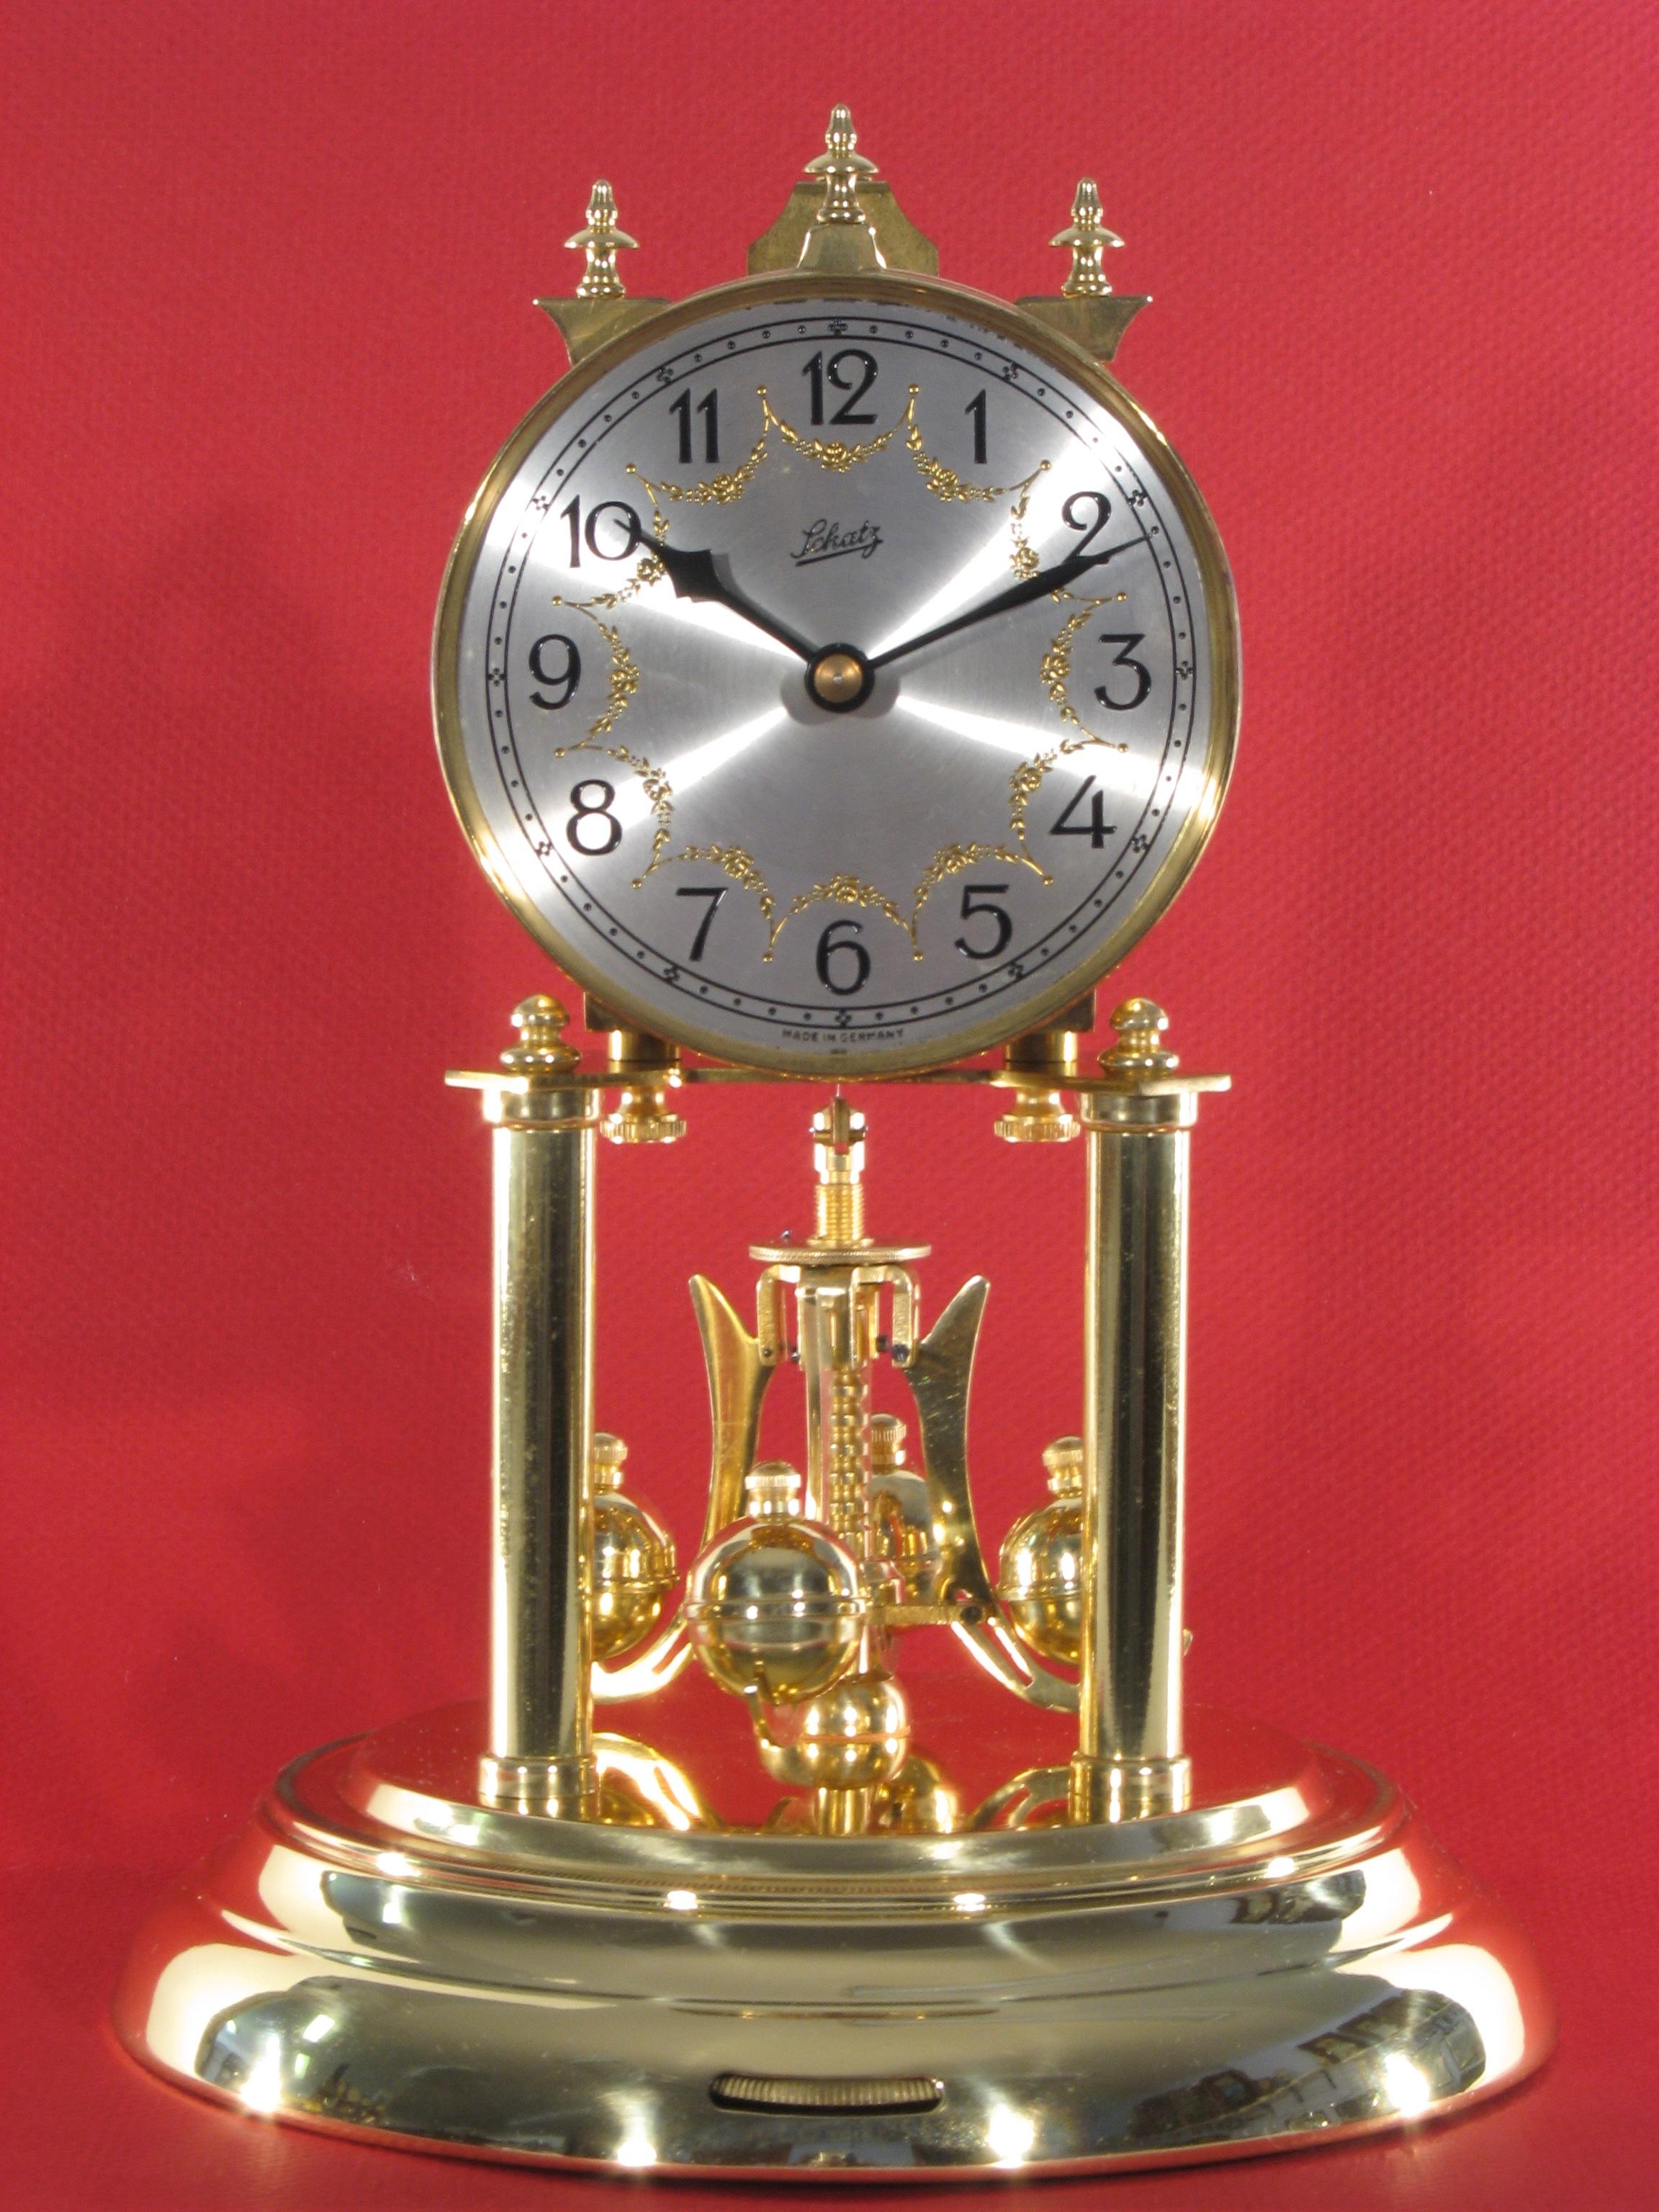 Schatz Standard 400 Day Clock With Silver Dial, Made Sept